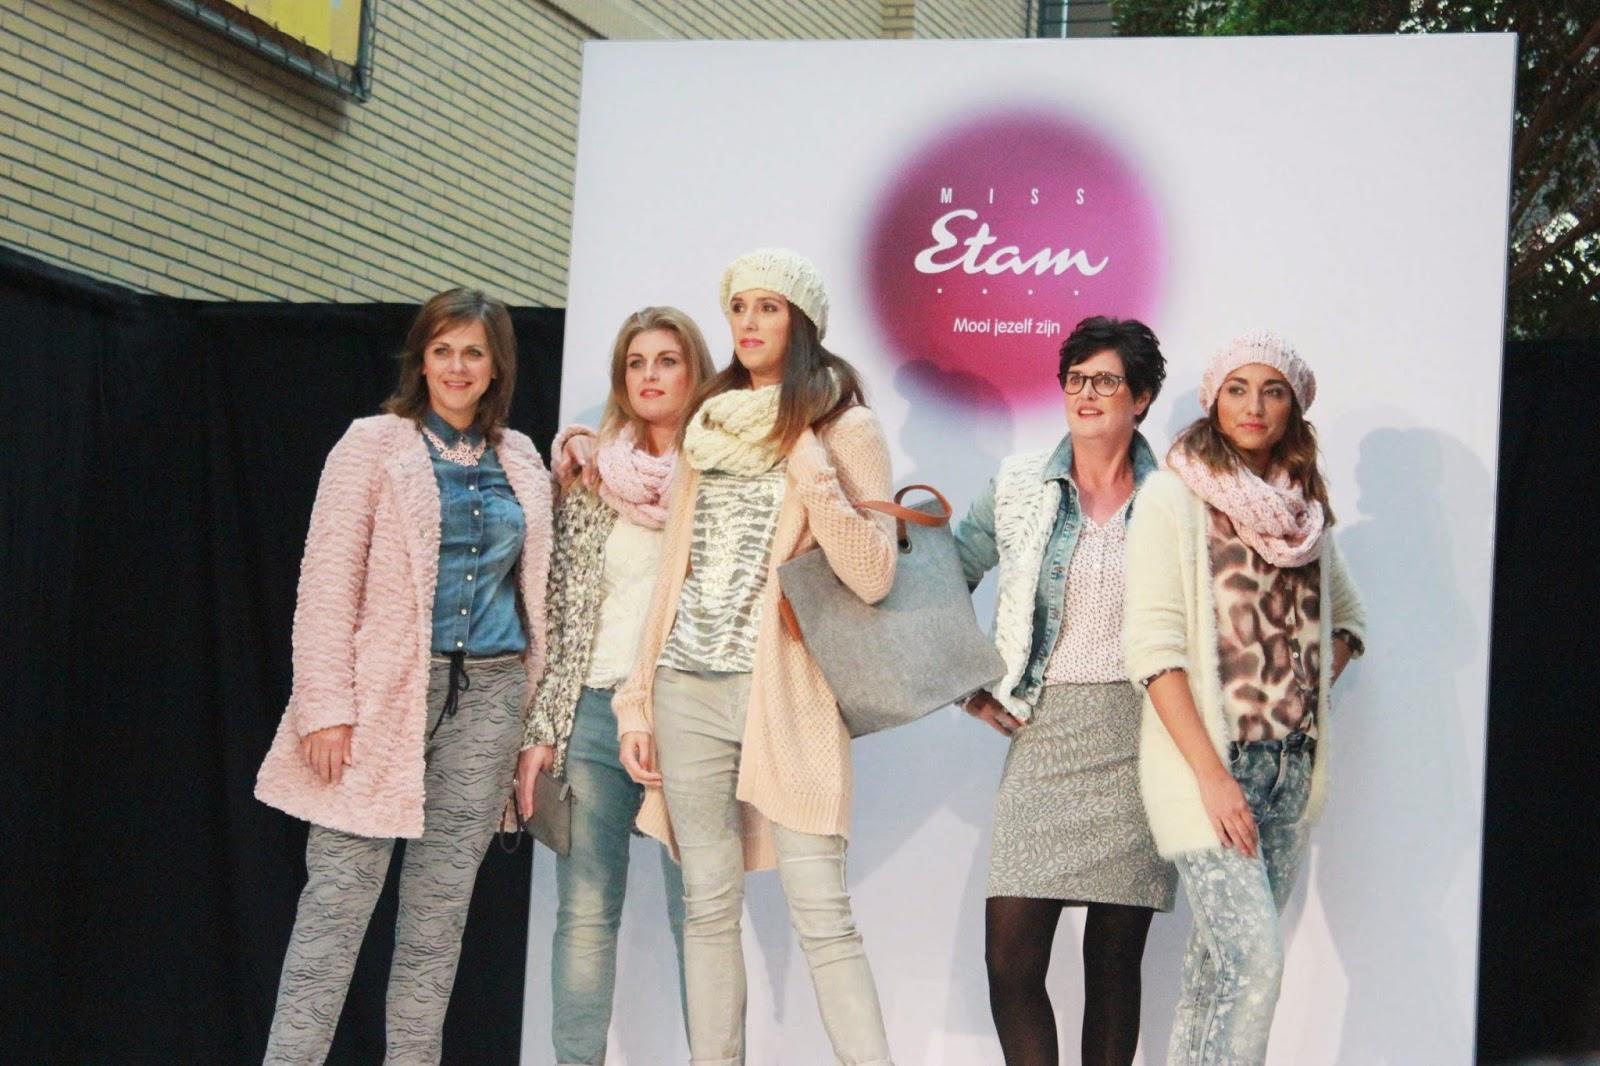 Event   Miss Etam & Promiss Fashionfeestje - The Budget Life